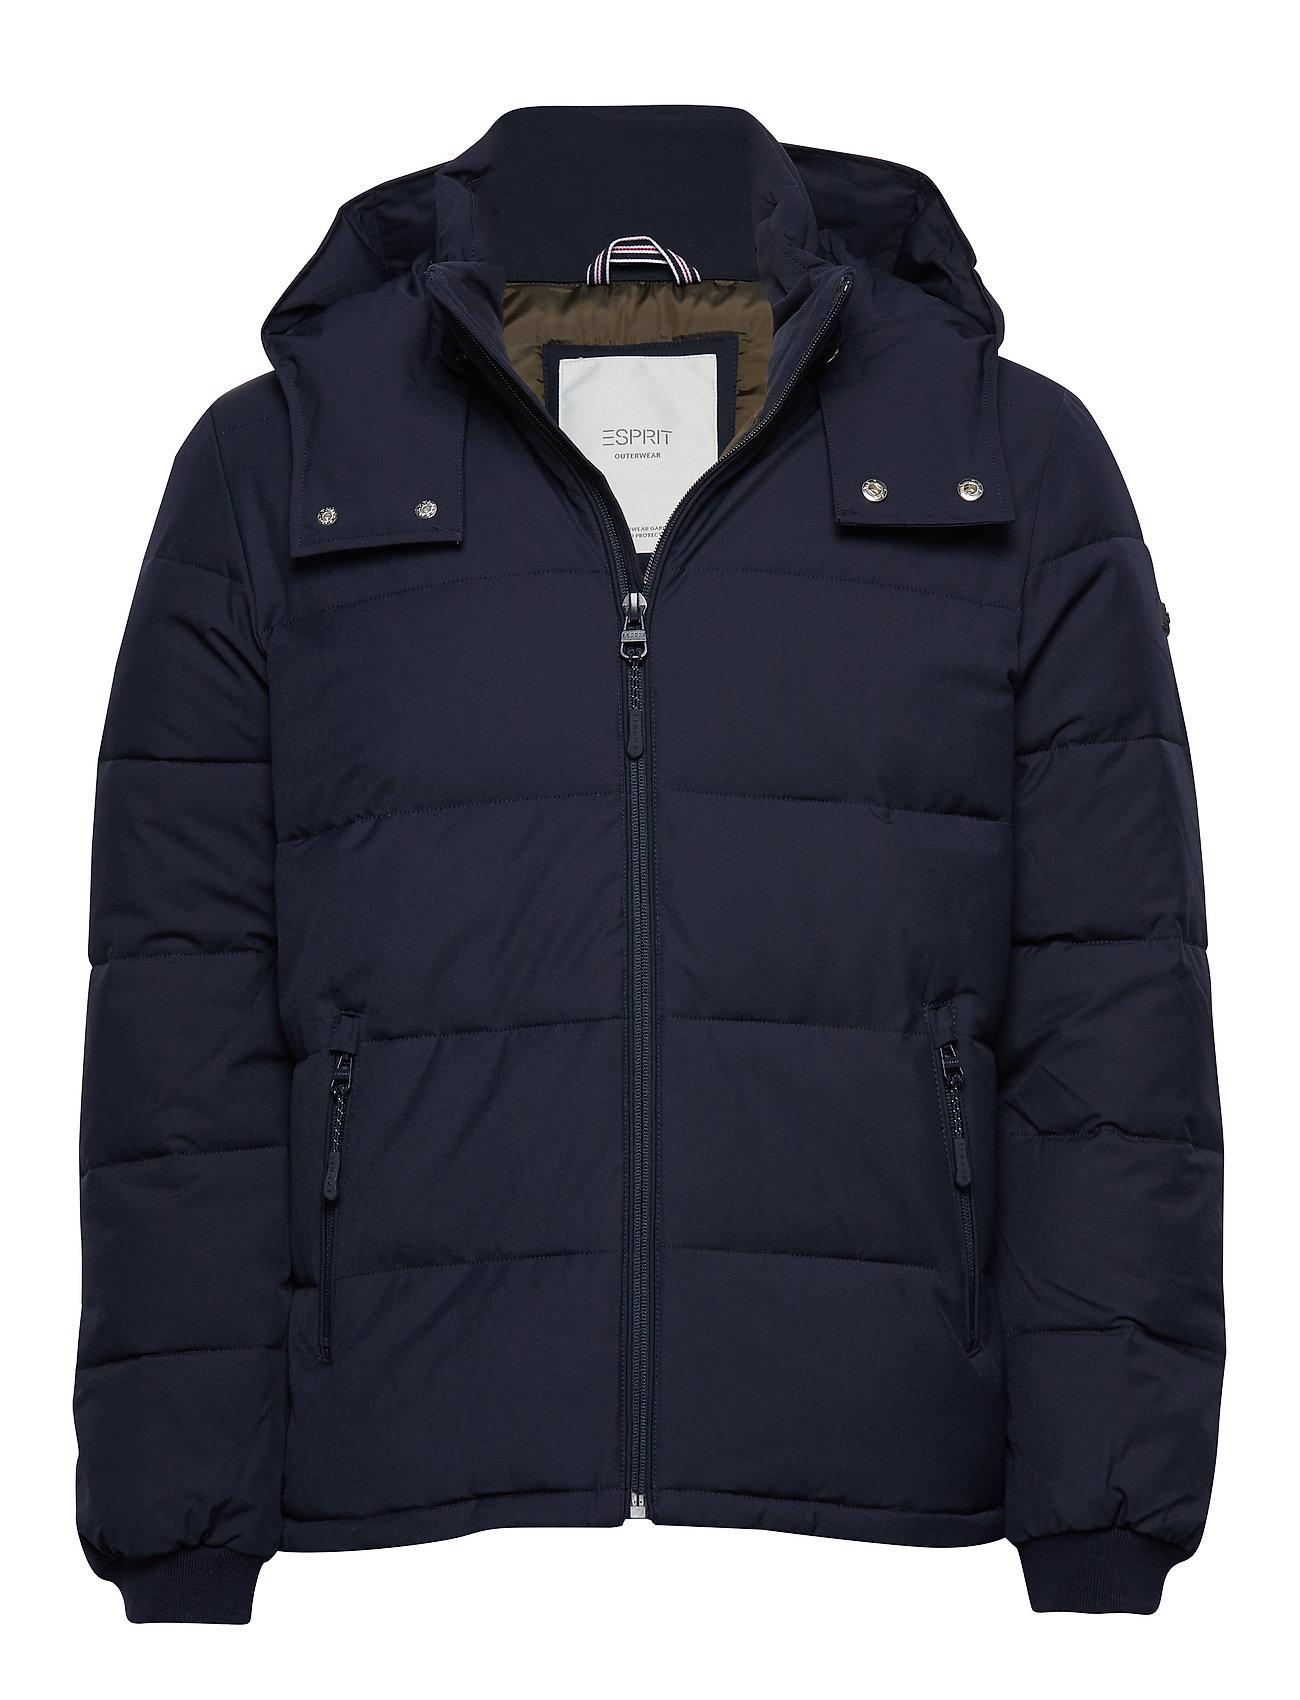 ESPRIT Jackets Outdoor Woven Gefütterte Jacke Blau ESPRIT CASUAL